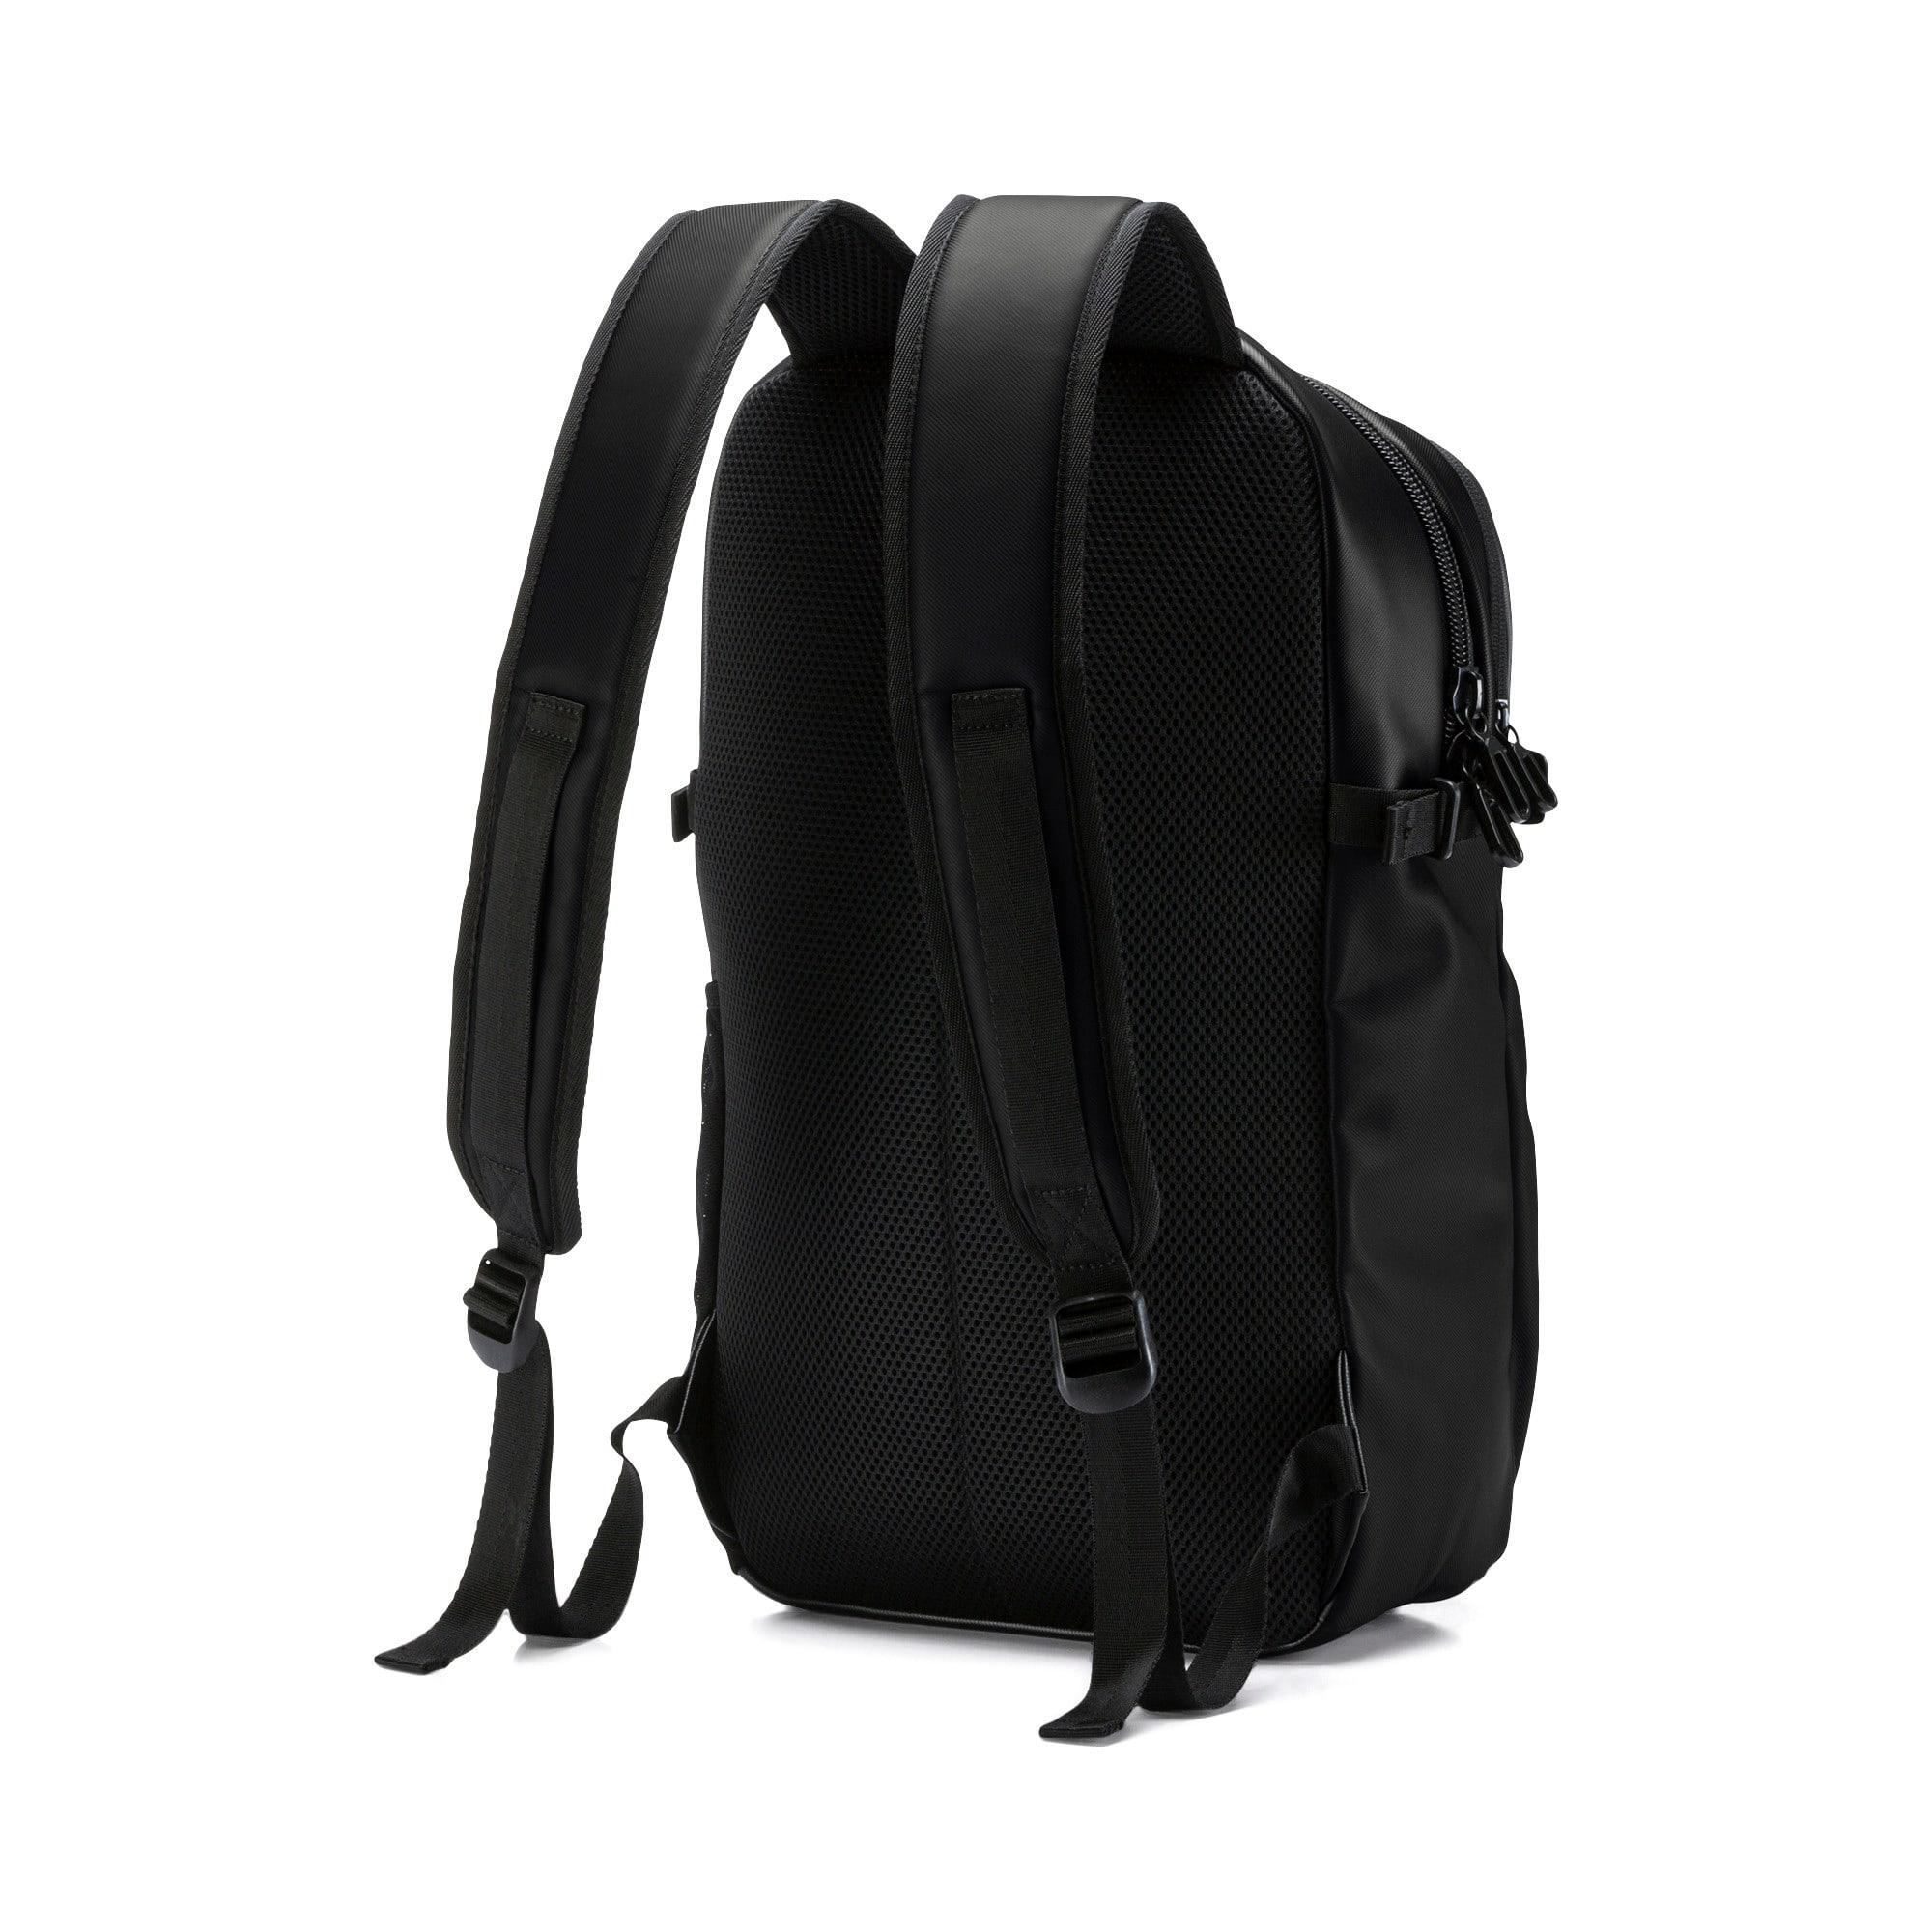 Thumbnail 2 of Scuderia Ferrari Lifestyle Backpack, Puma Black, medium